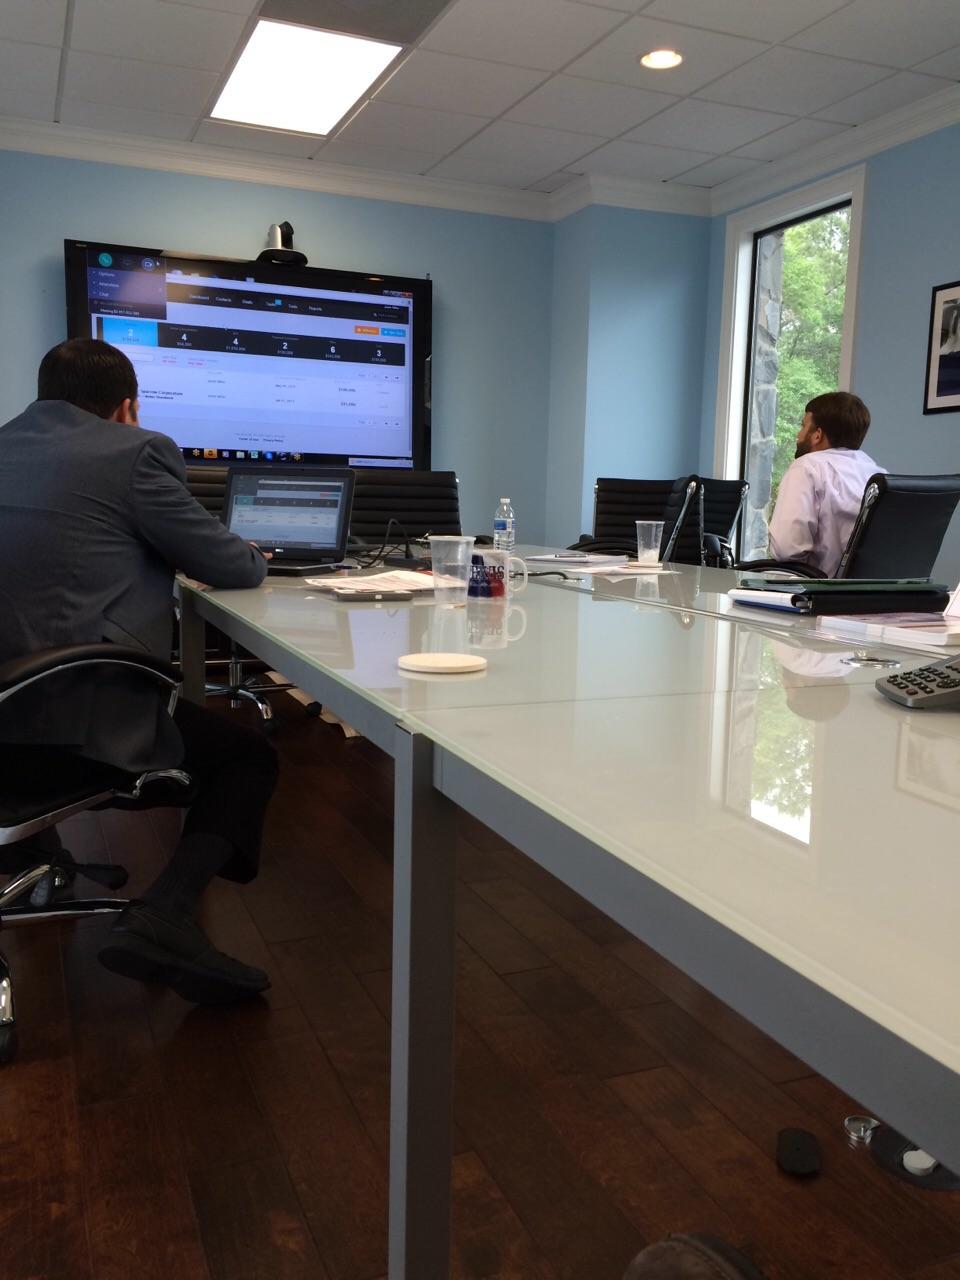 Josue & Les working on Telemedicine in Georgia